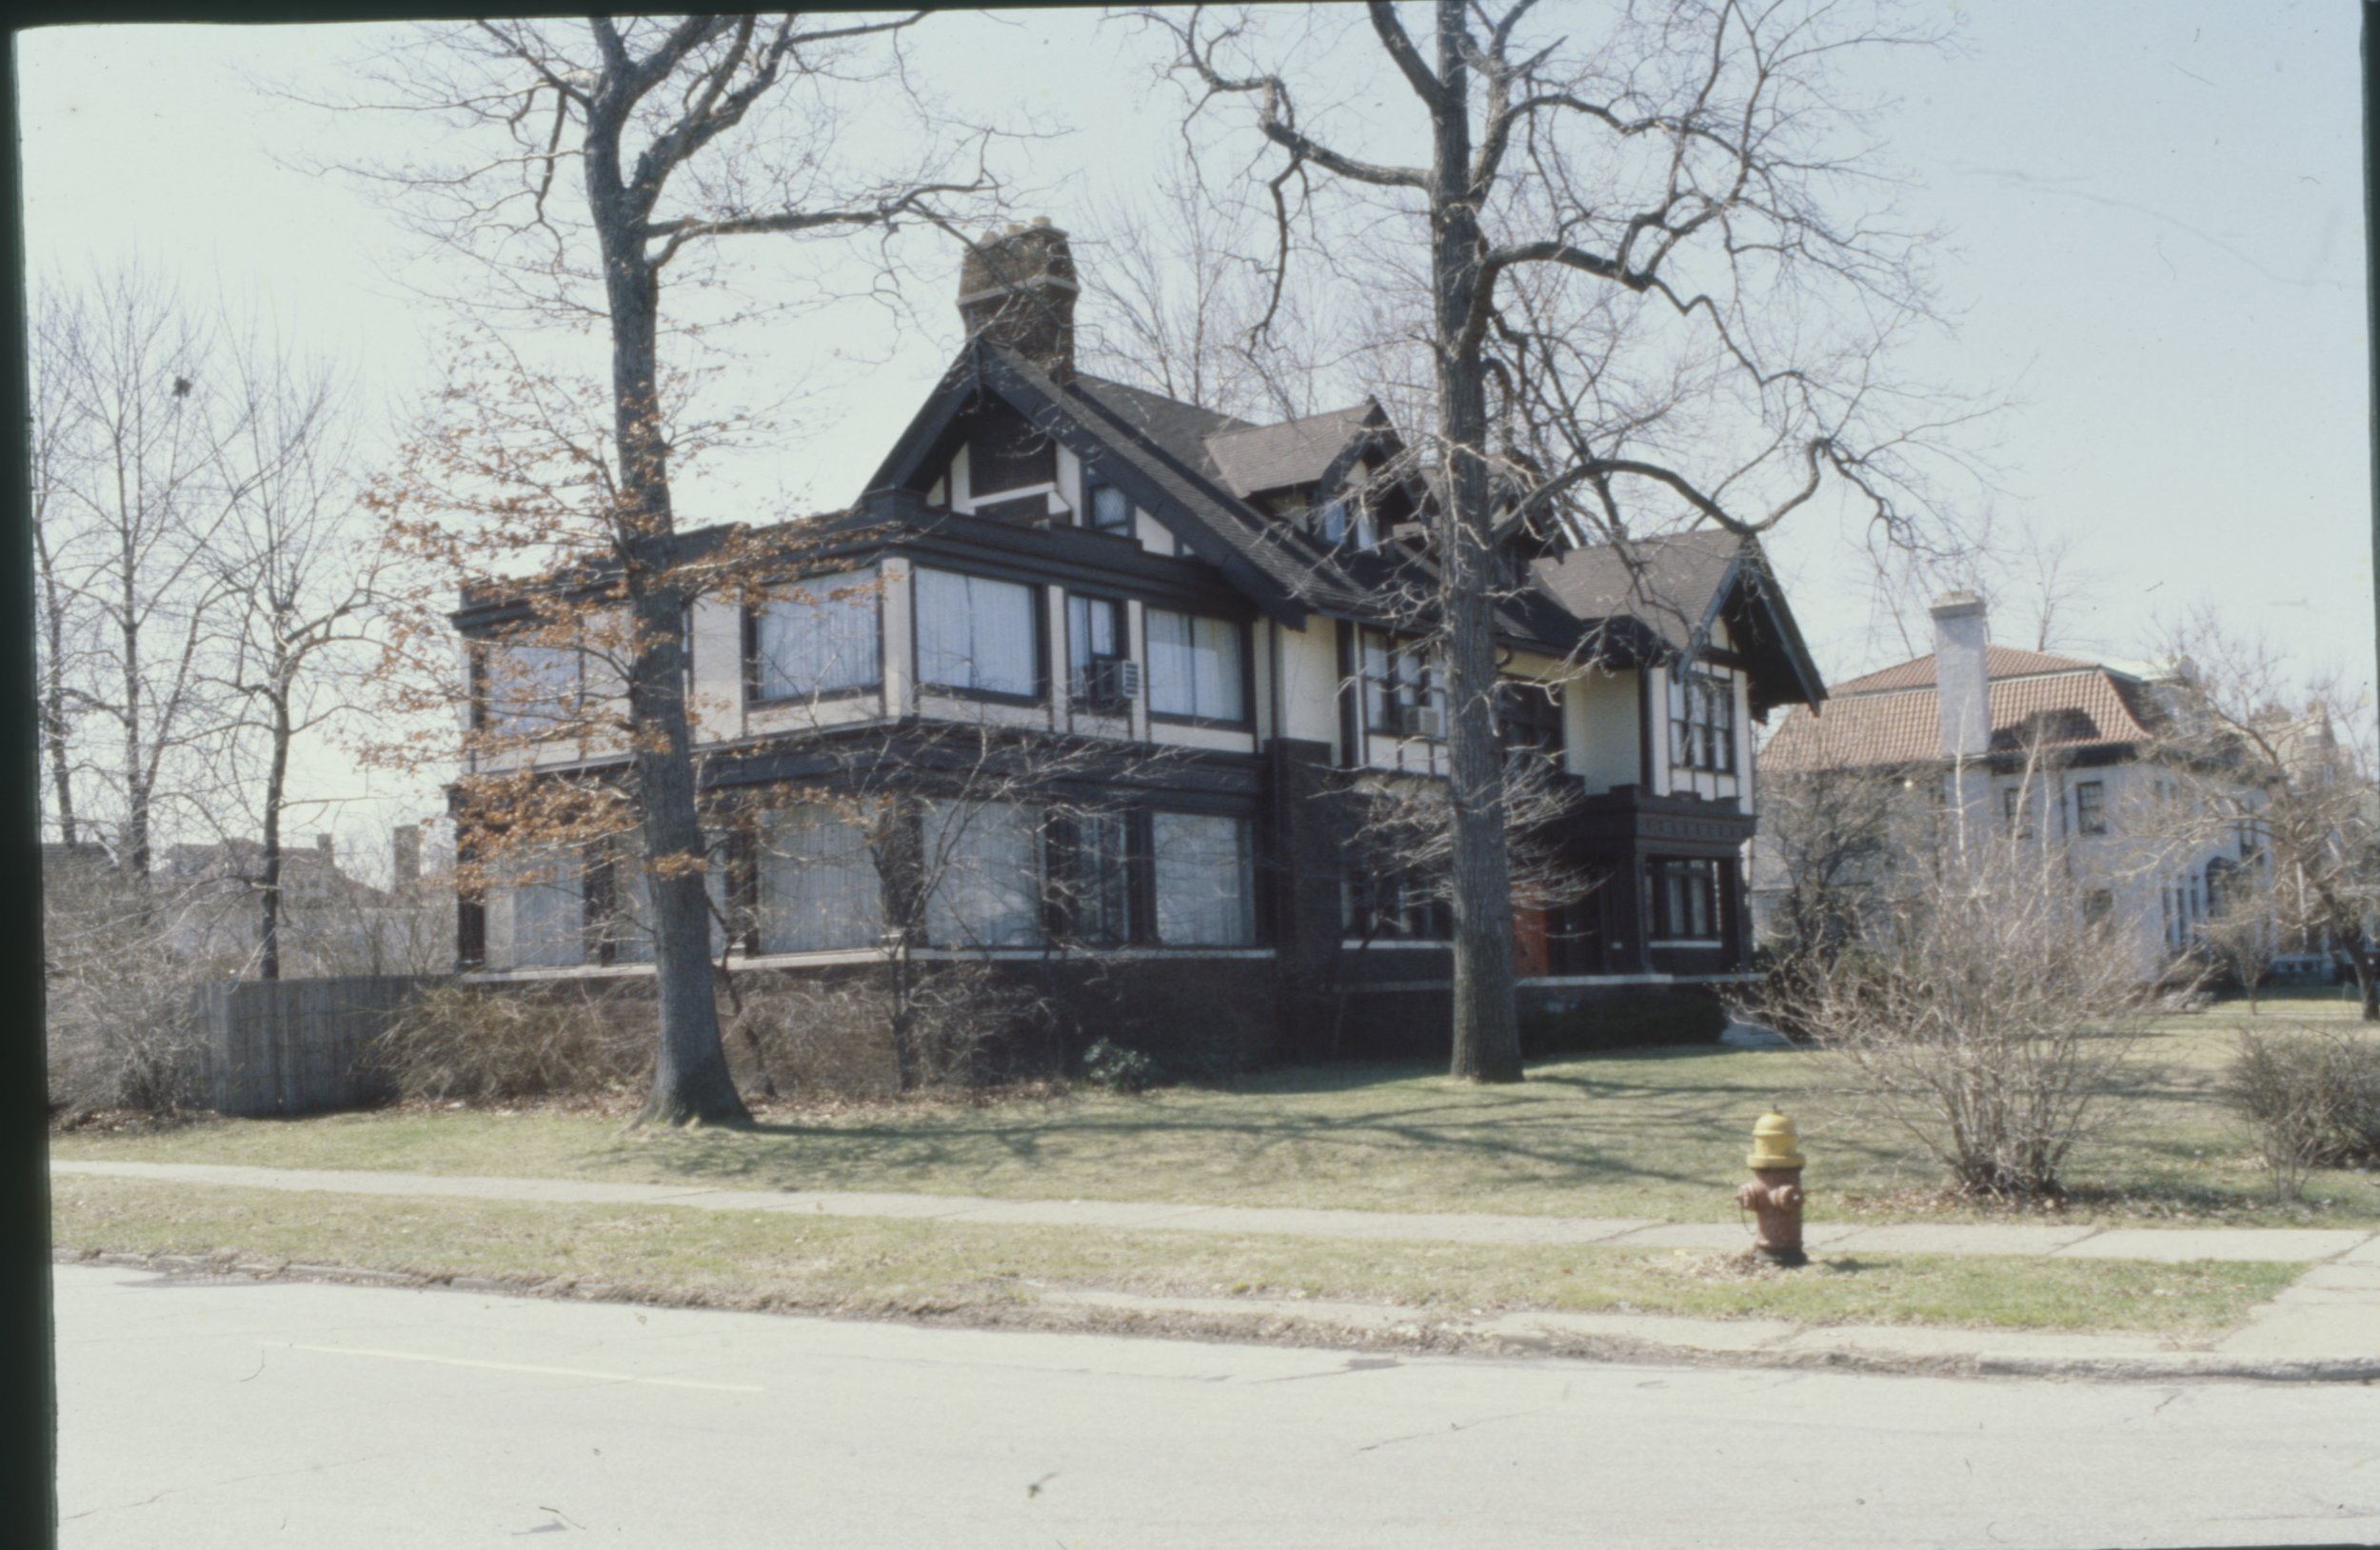 803 W. Boston 1980_2.jpg